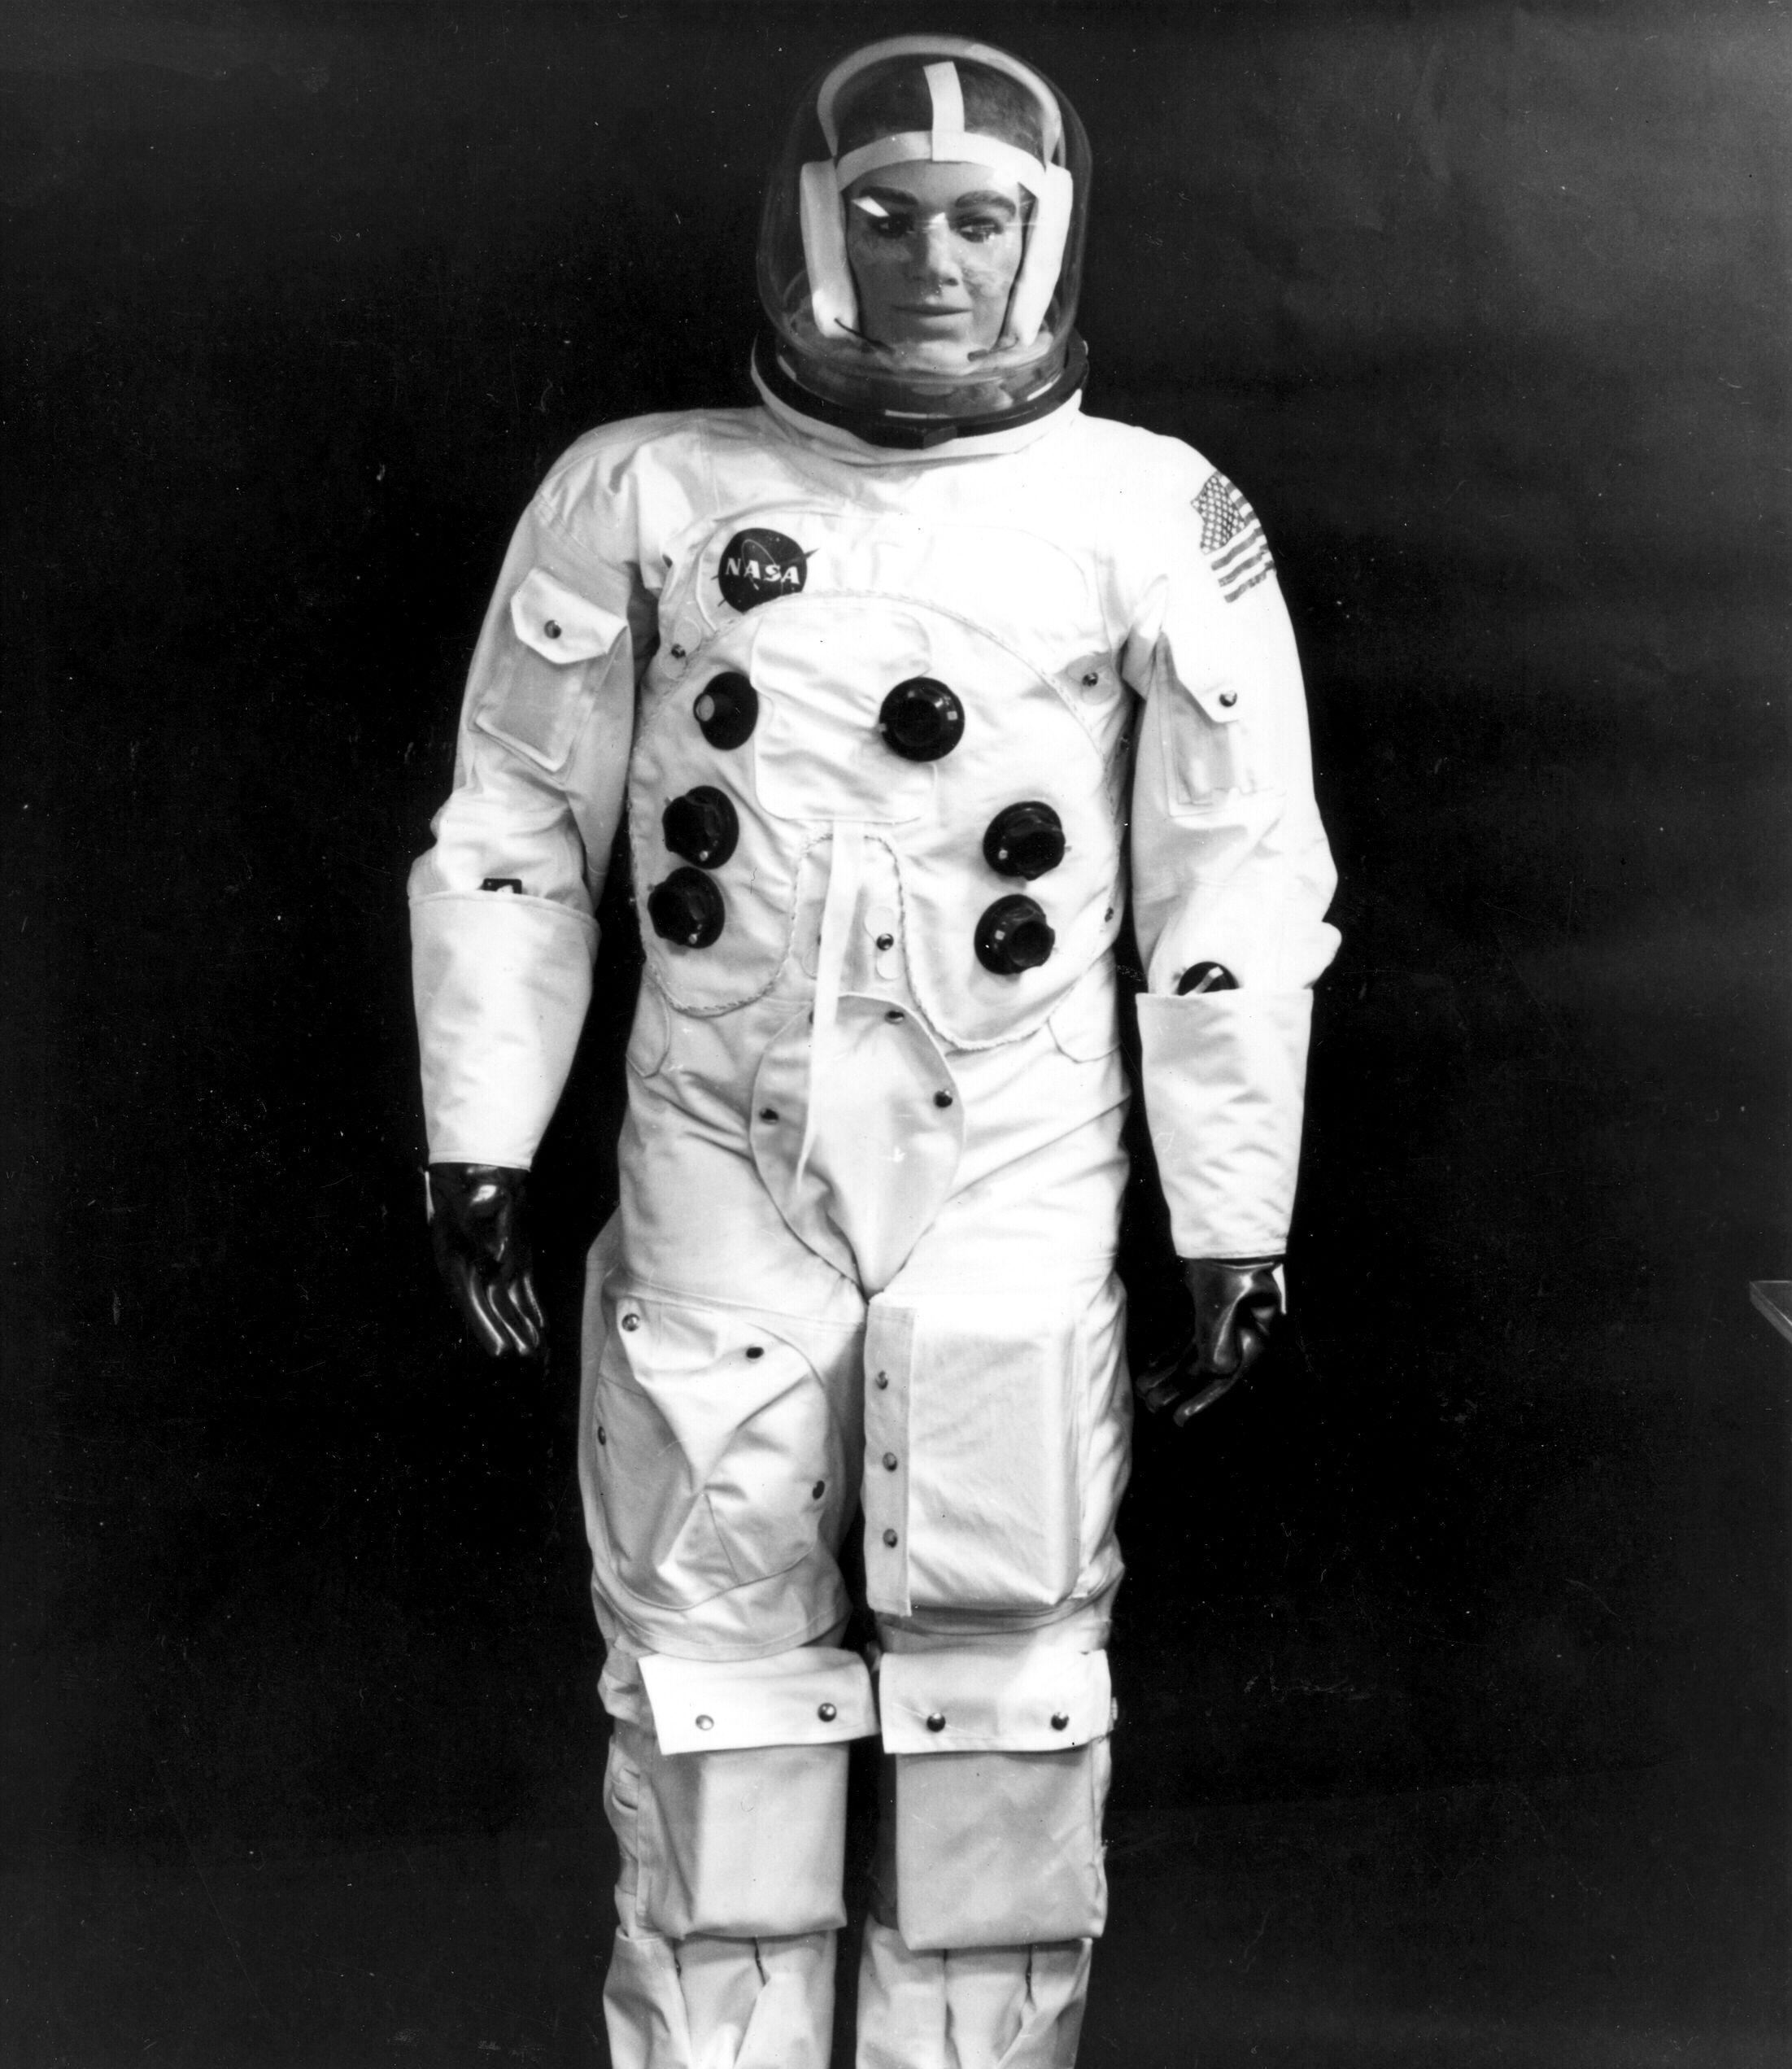 apollo 13 space suit - photo #36